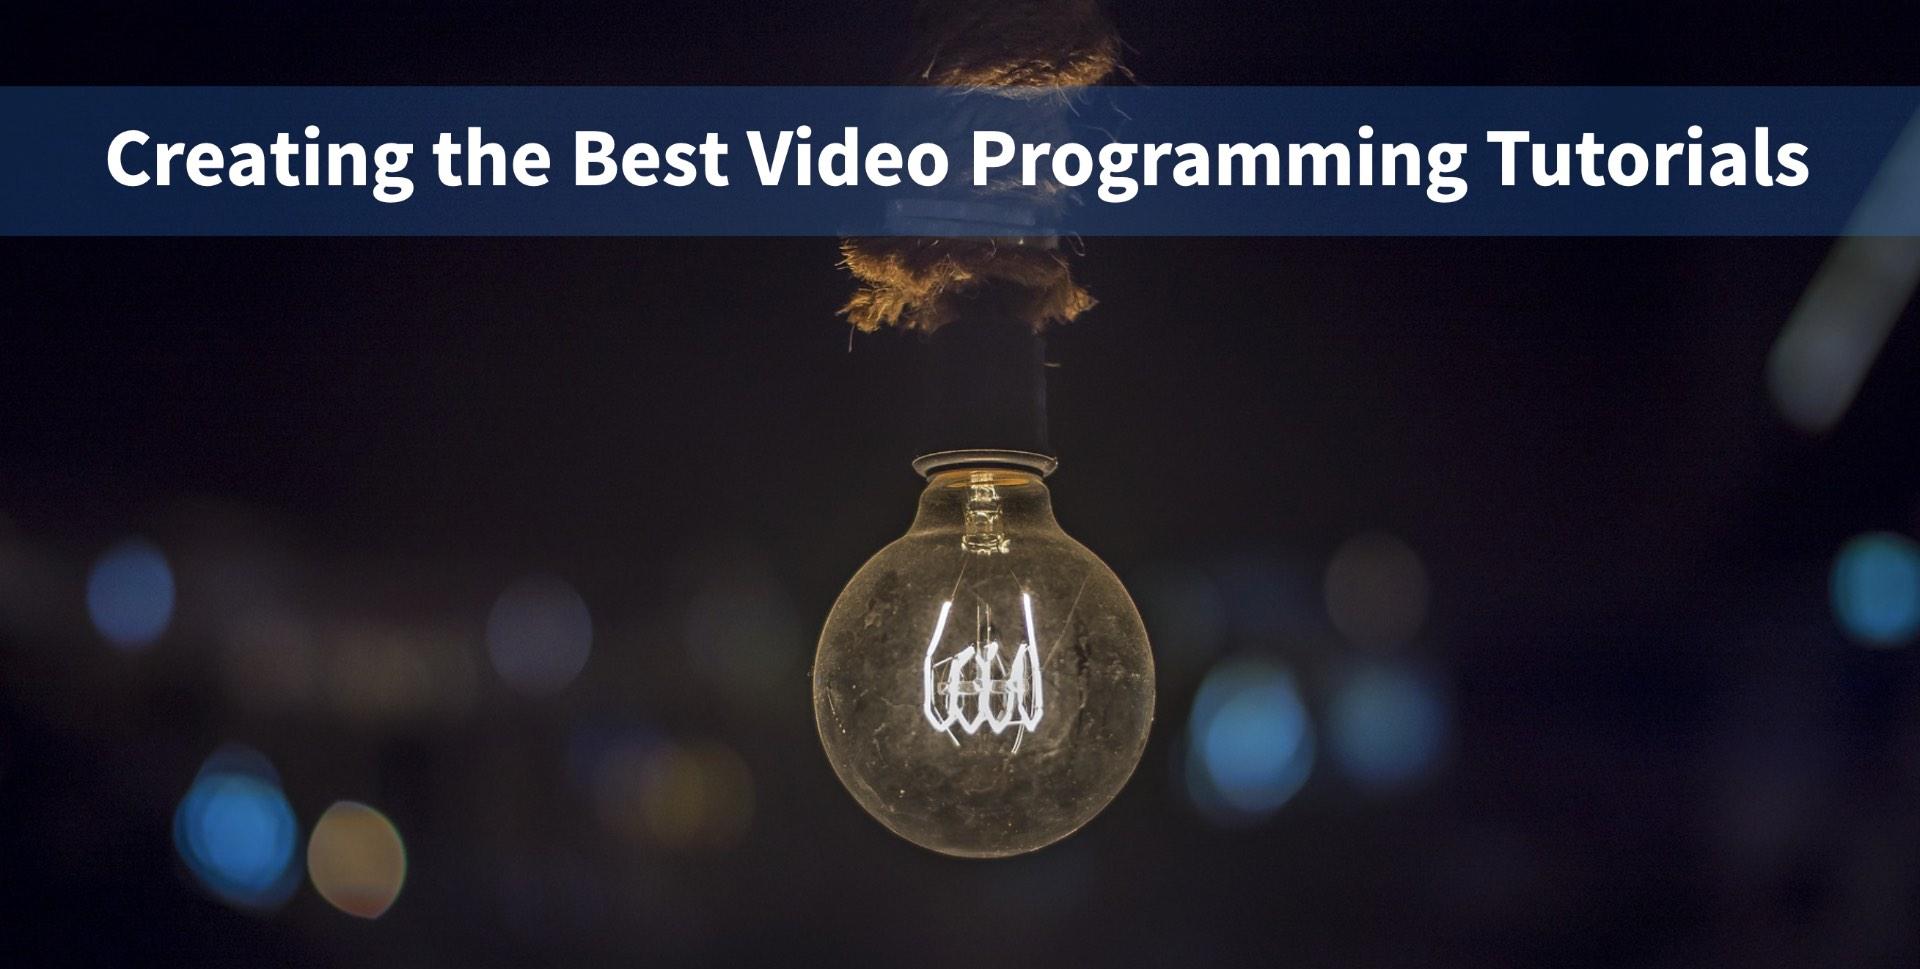 Creating the Best Video Programming Tutorials